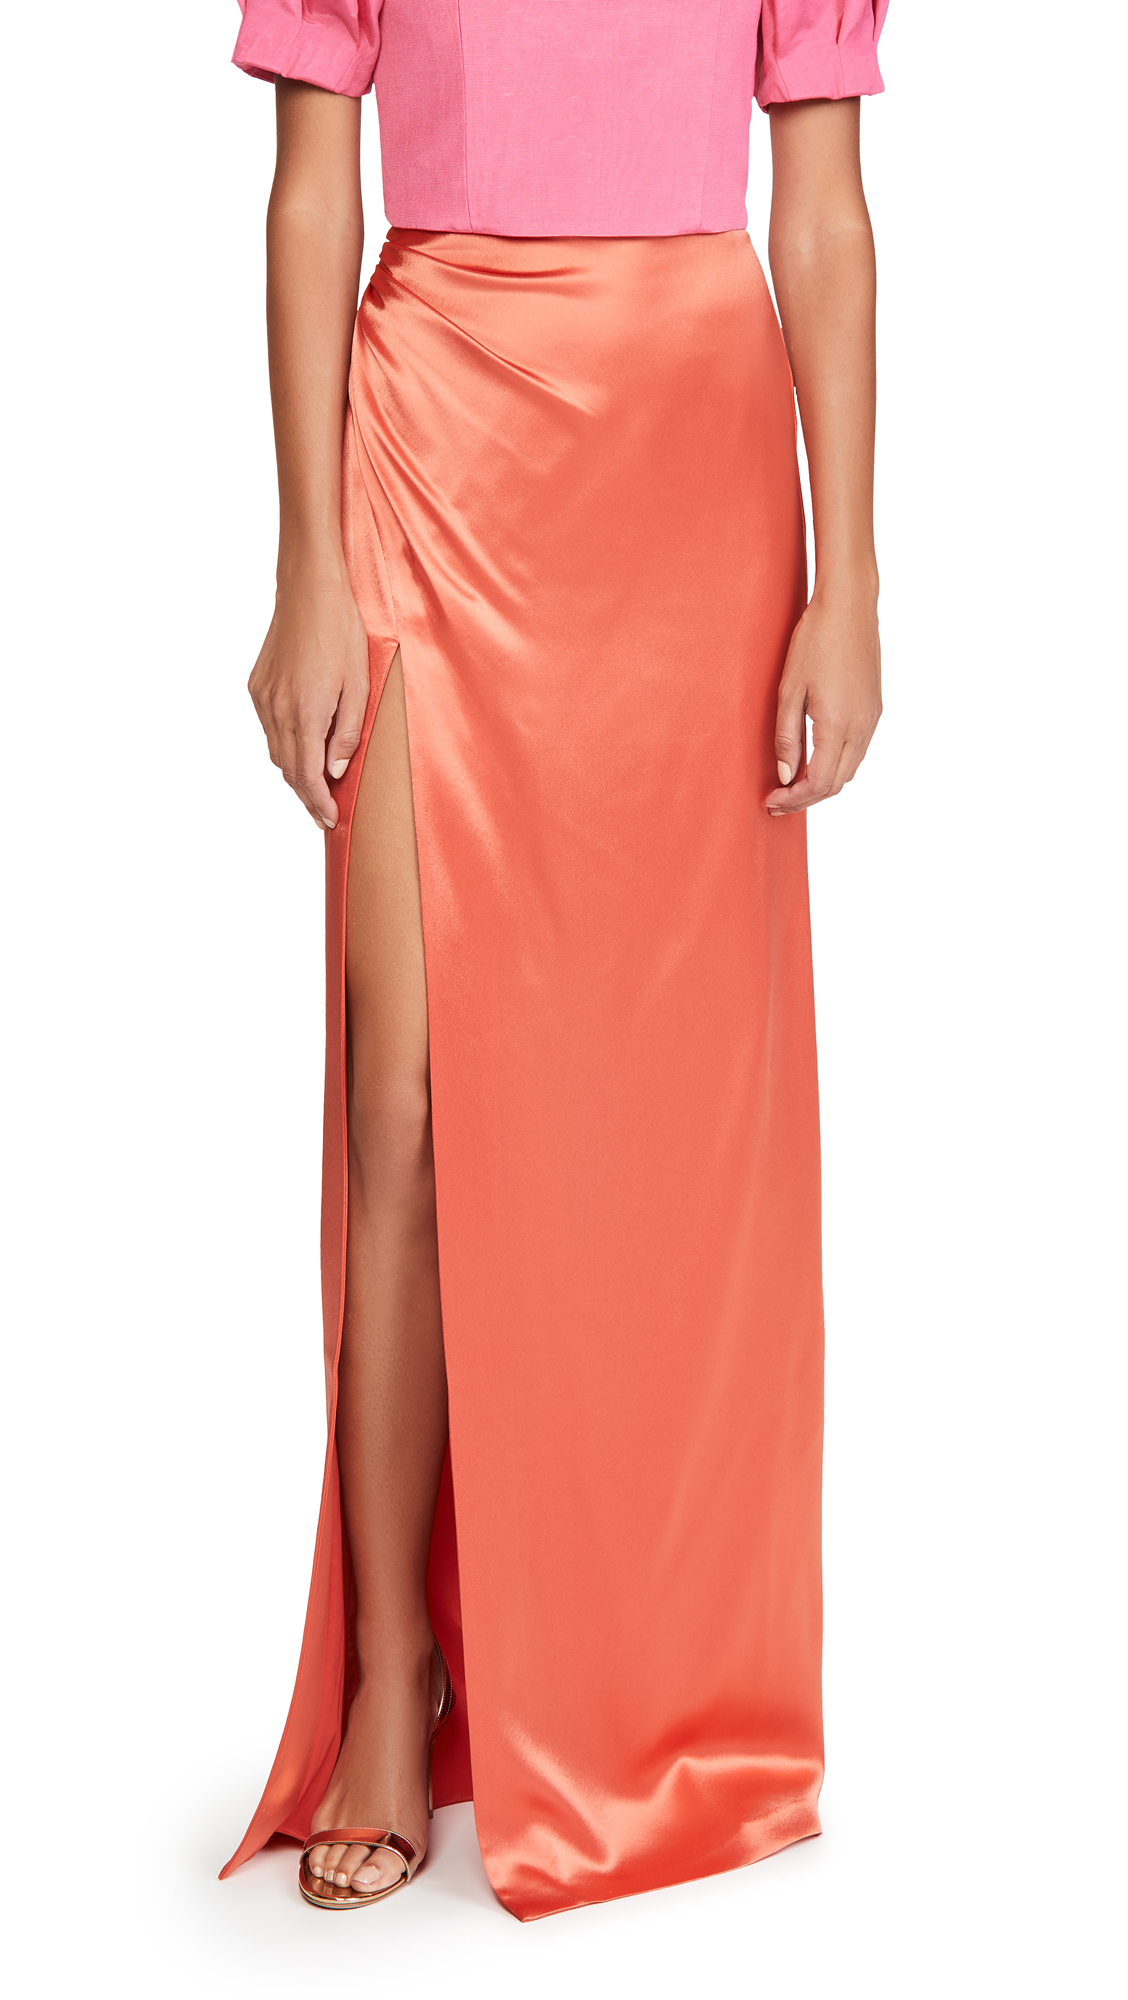 Cinq a Sept Kaitlyn Skirt